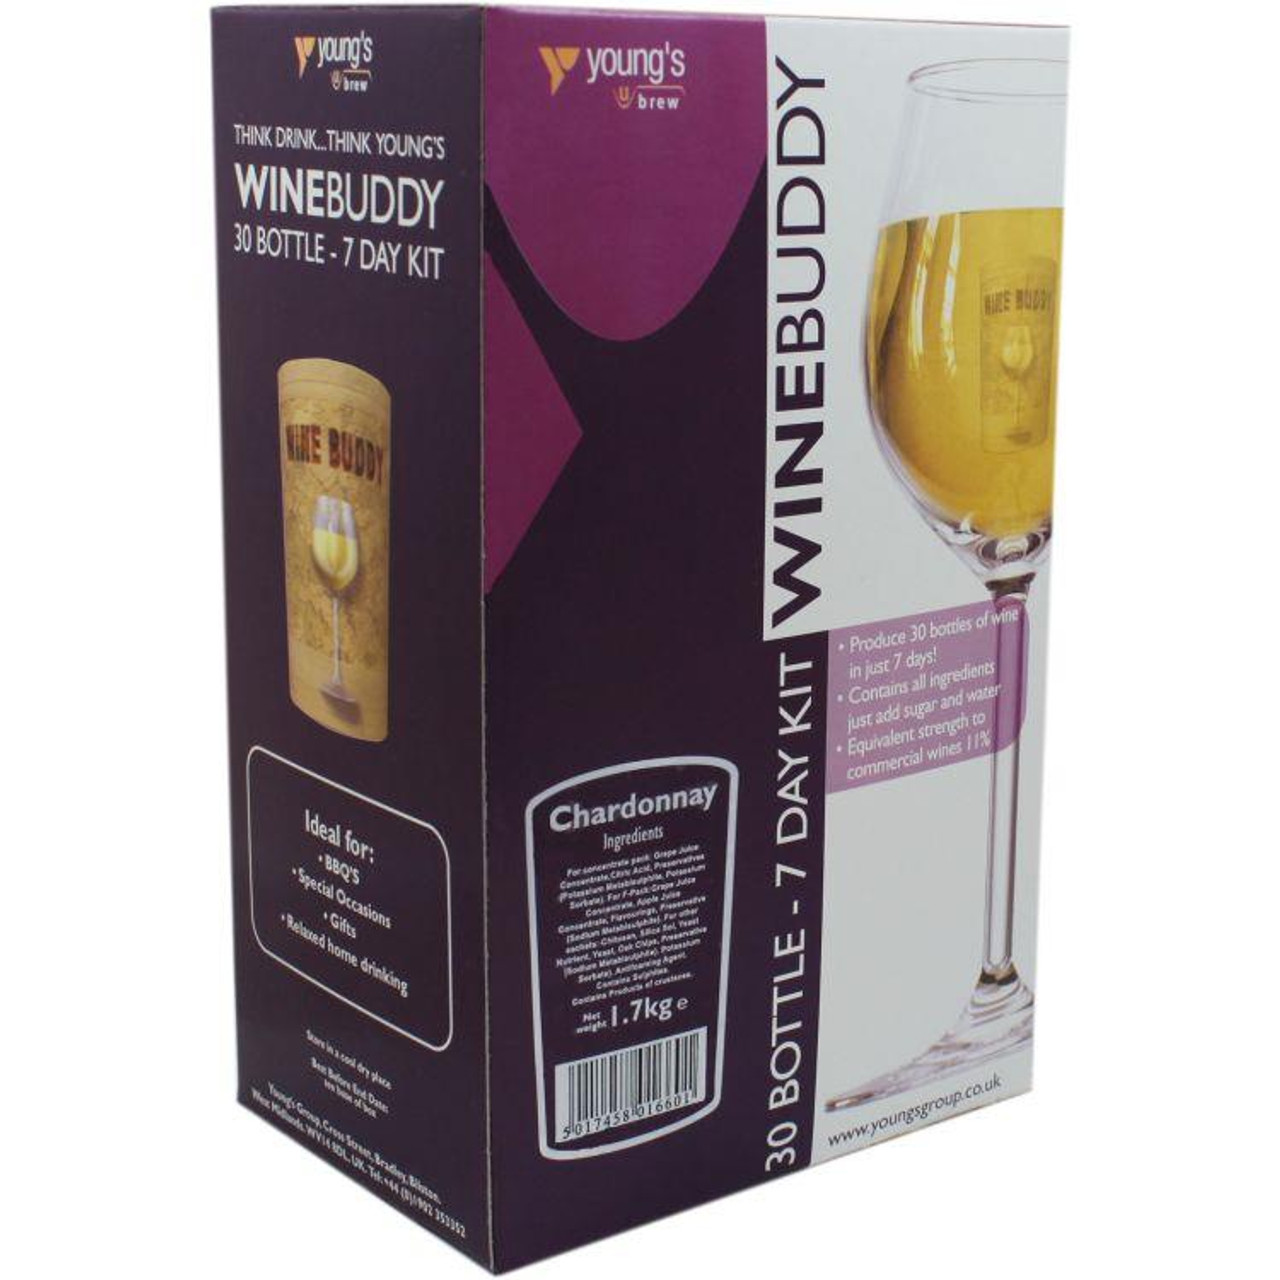 Youngs WineBuddy Chardonnay 30 Bottle Kit